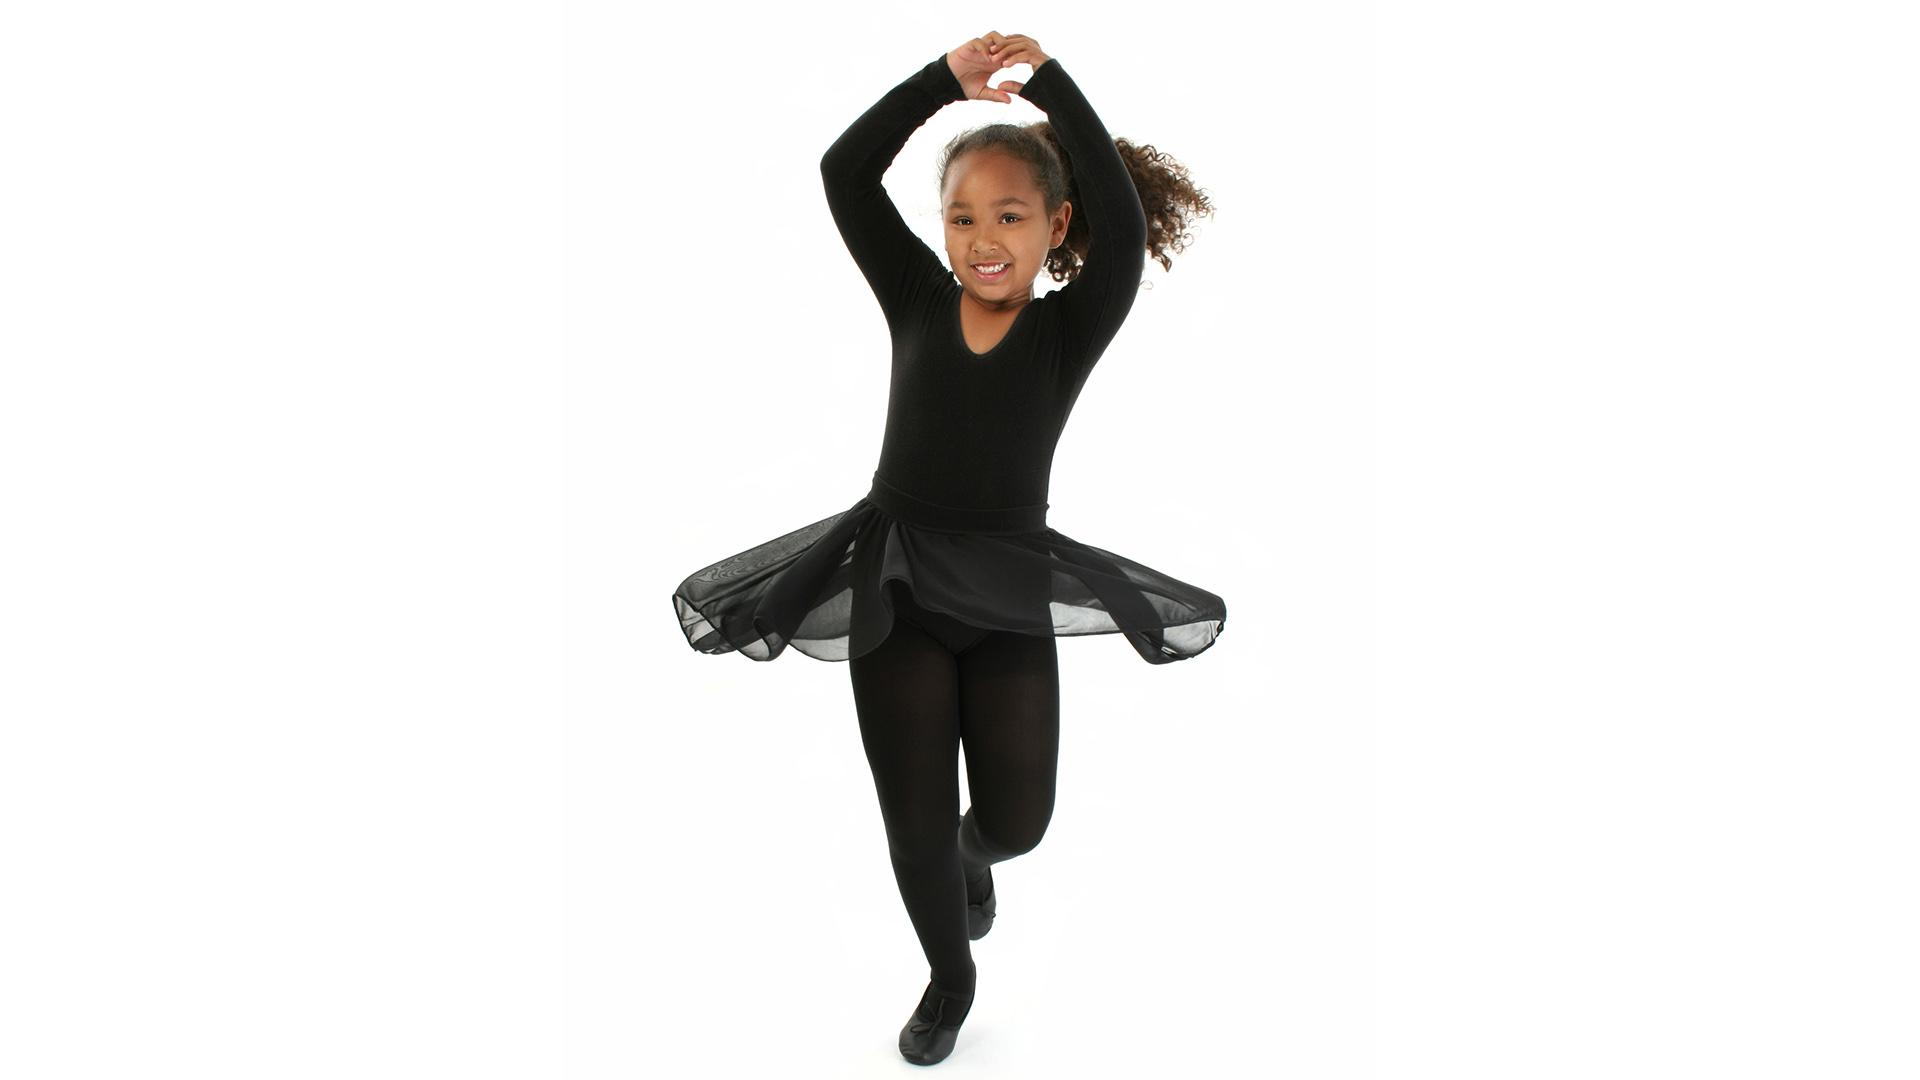 Kinderjazz Surrey White Rock Langley Bc School Of Music Dance Ballet Moves Diagram Classes Jazz Tap Hip Hop Lyrical Musical Theatre